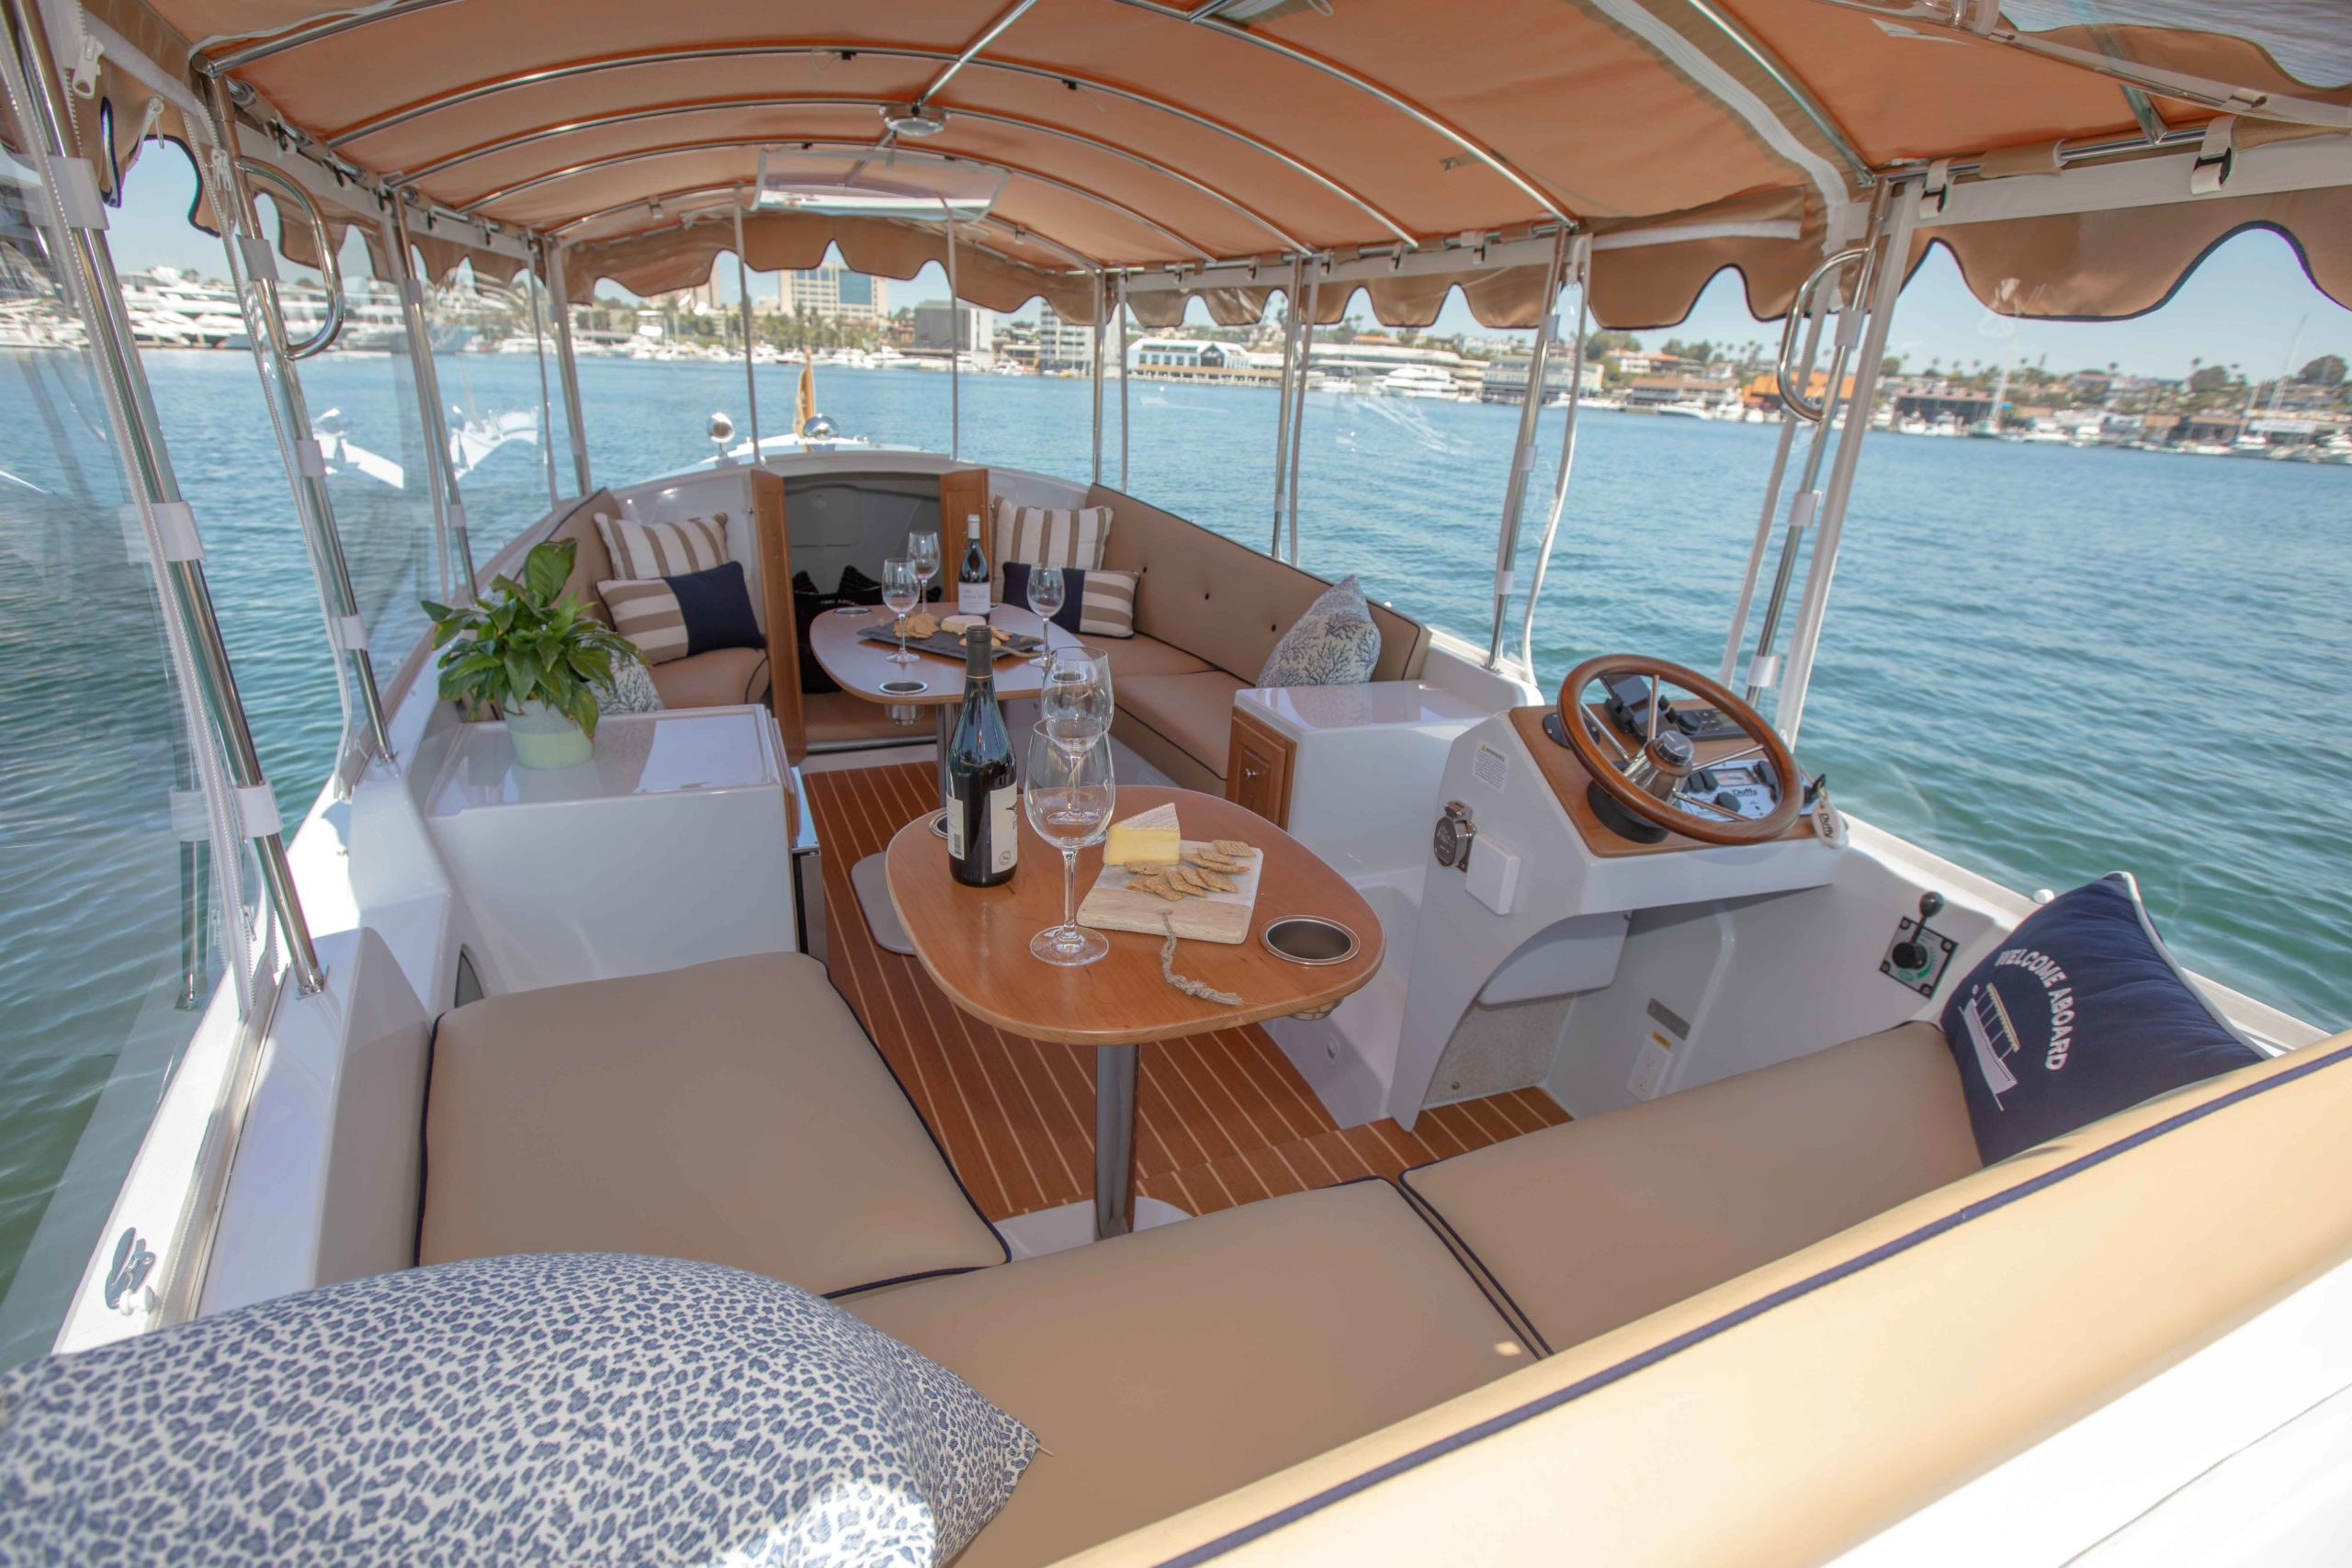 Duffy-Electric-Boats-22-Cuddy-Cabin-Interior-7